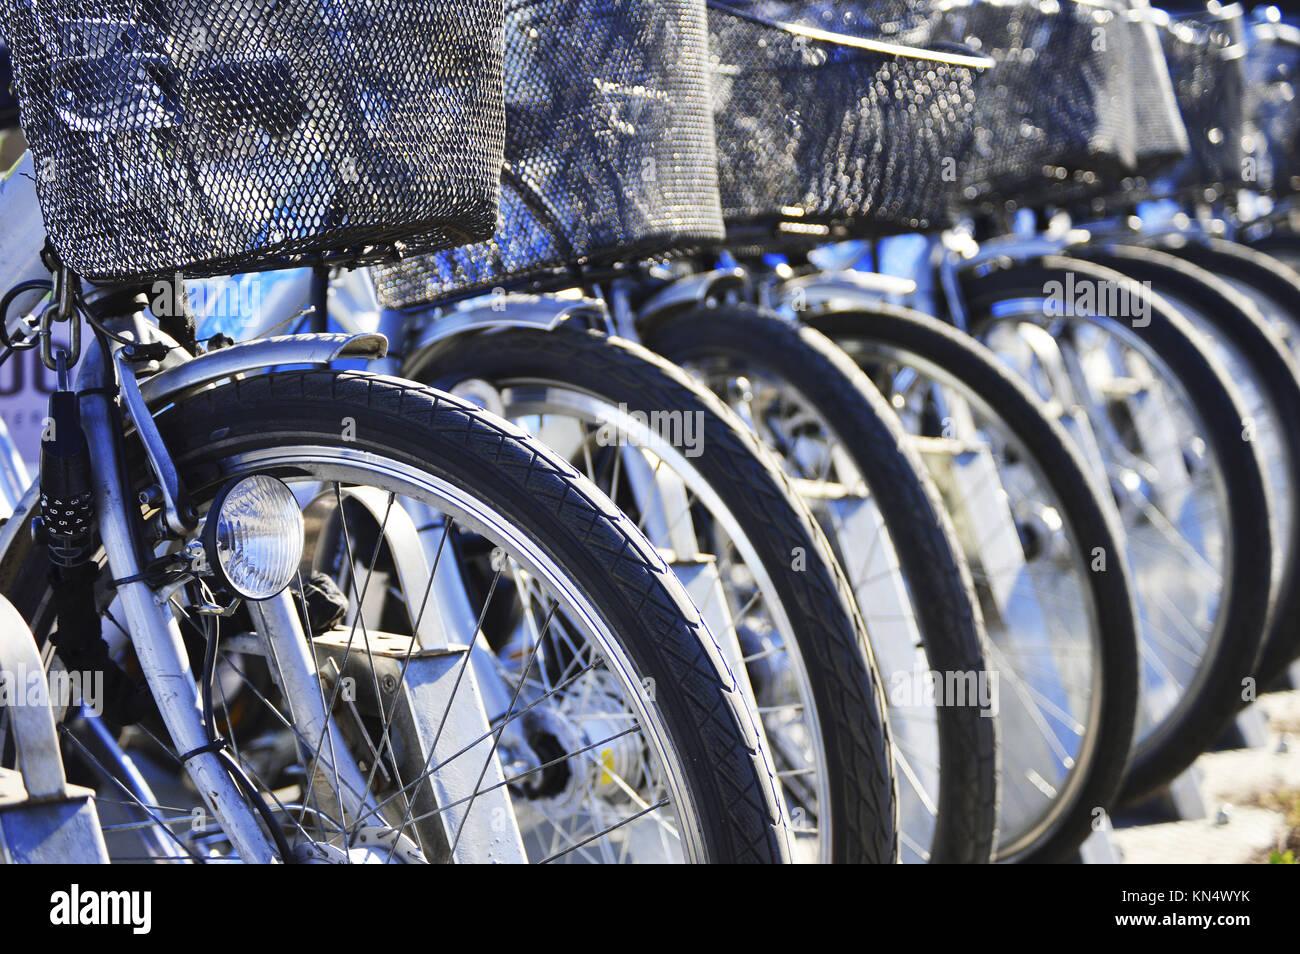 Public bicycle transportation system. - Stock Image